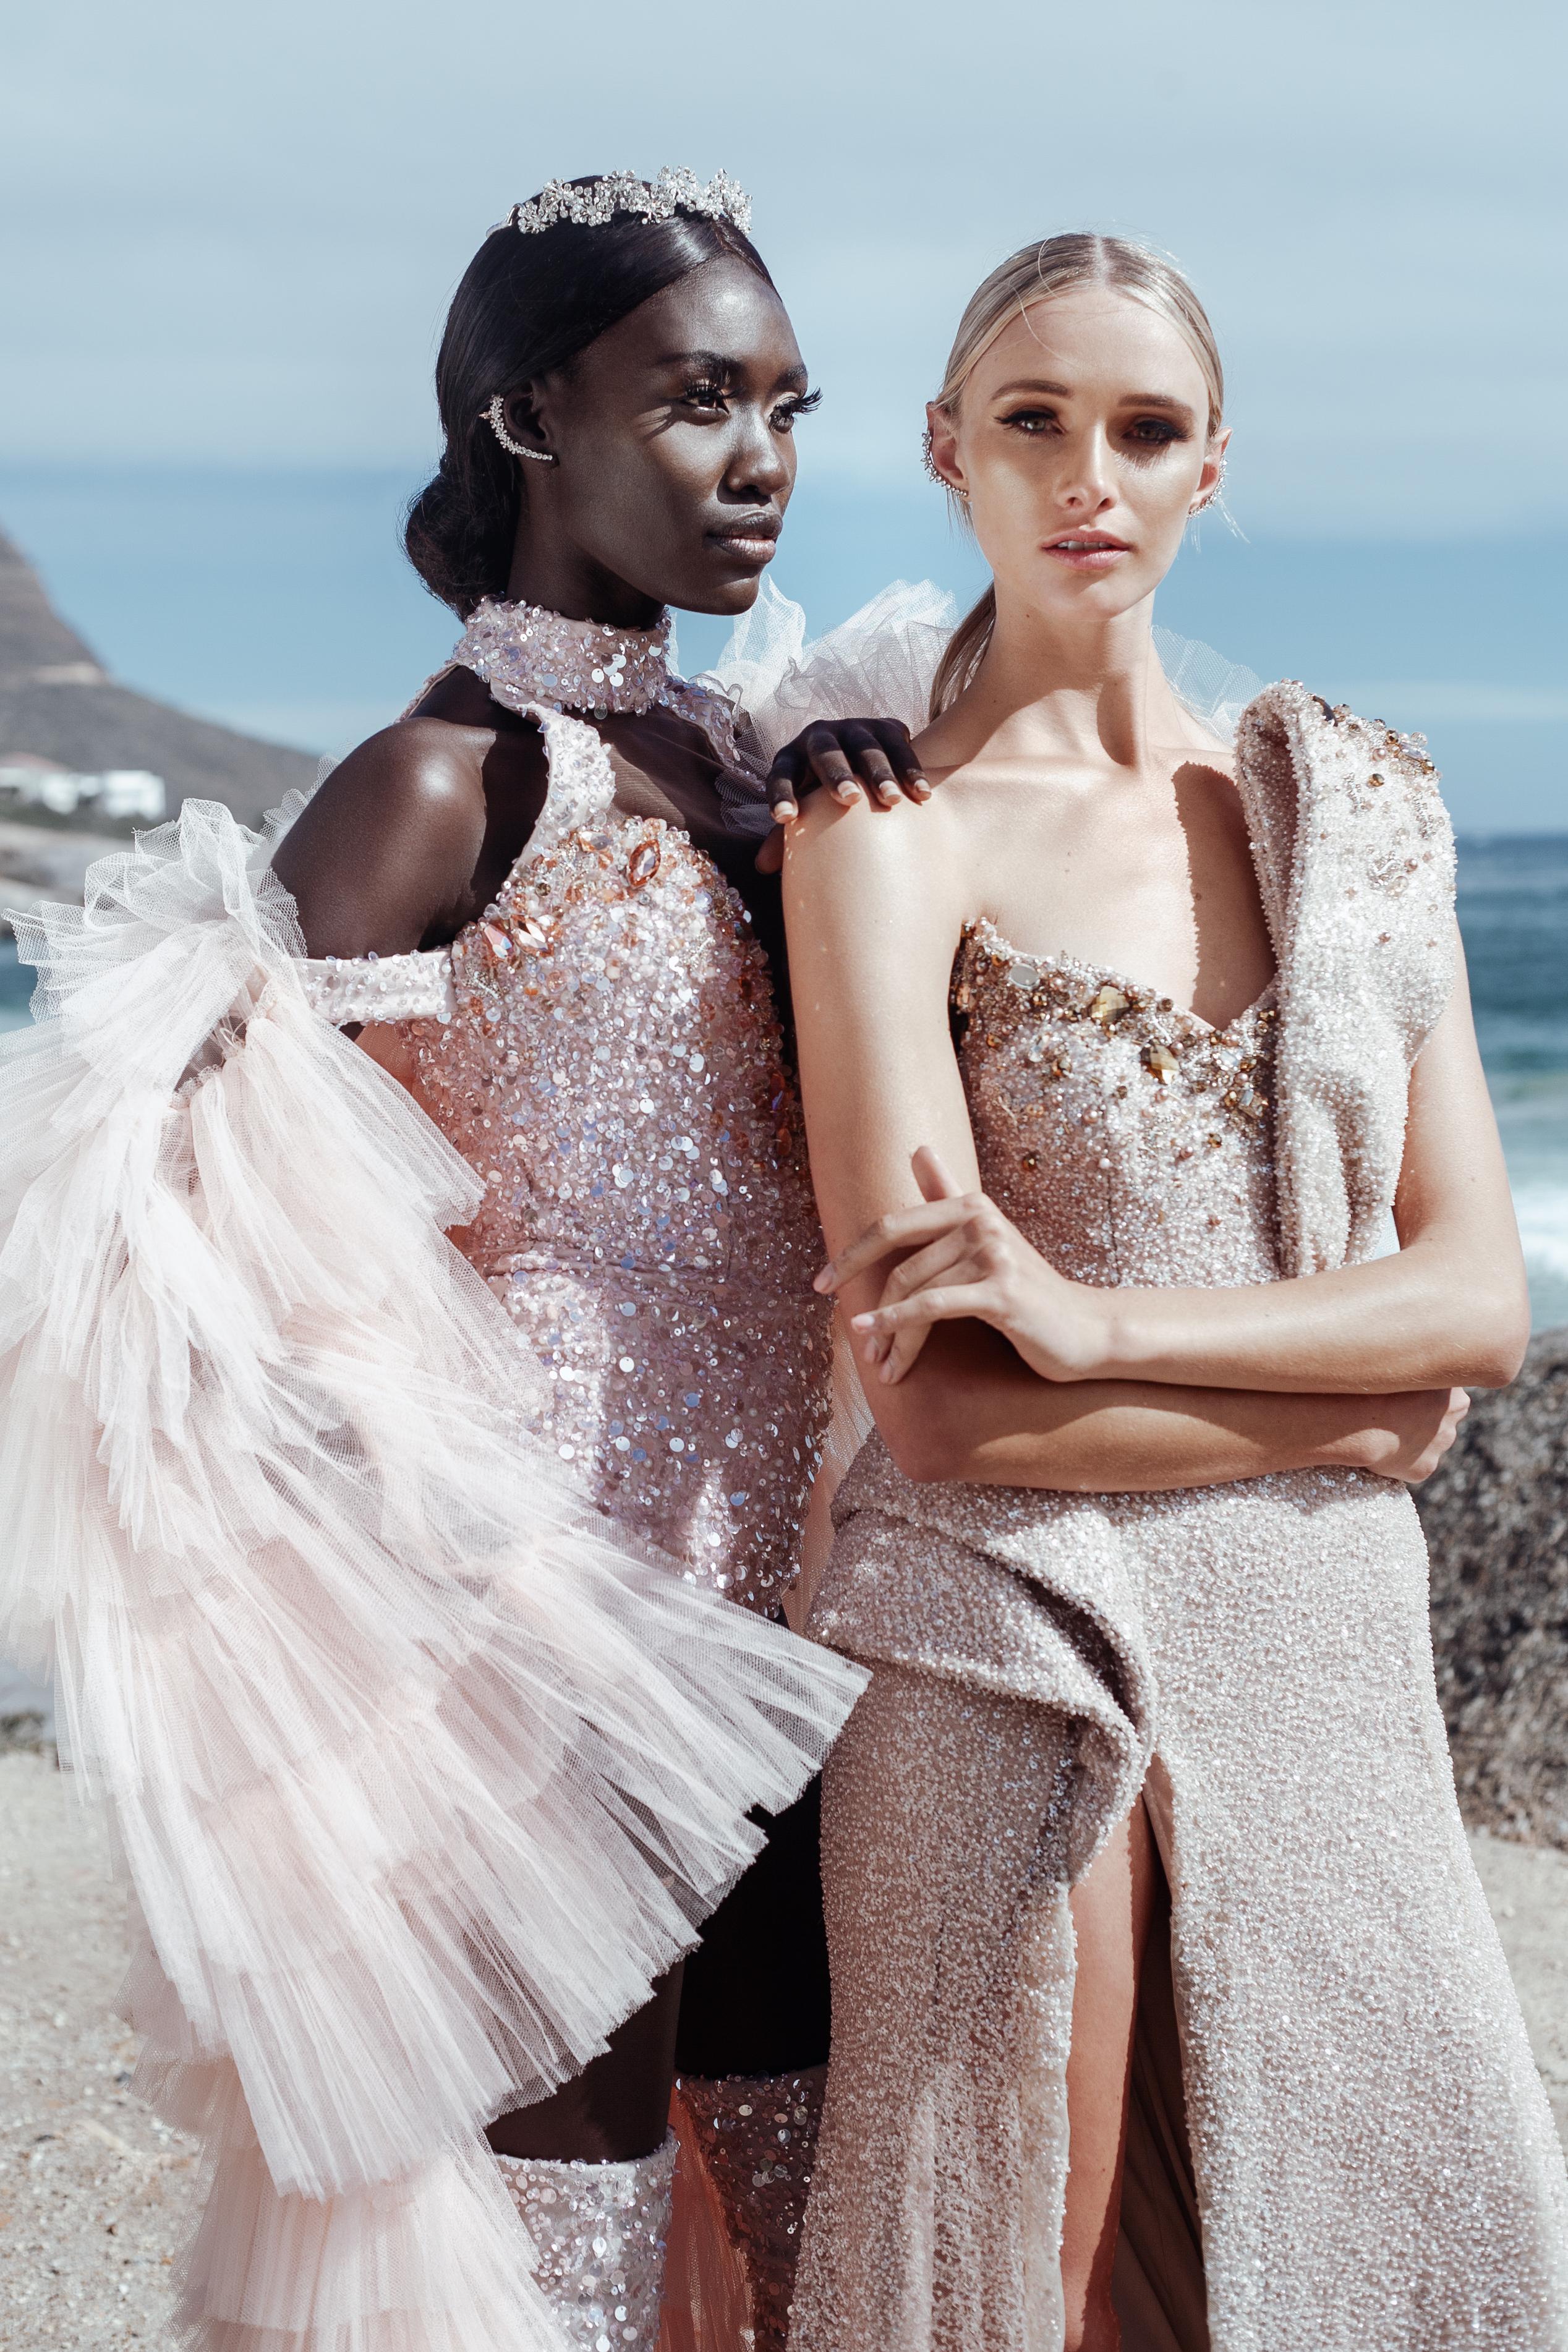 Meet The Womenswear Brand Taking South African Fashion To A New Level Bellanaija